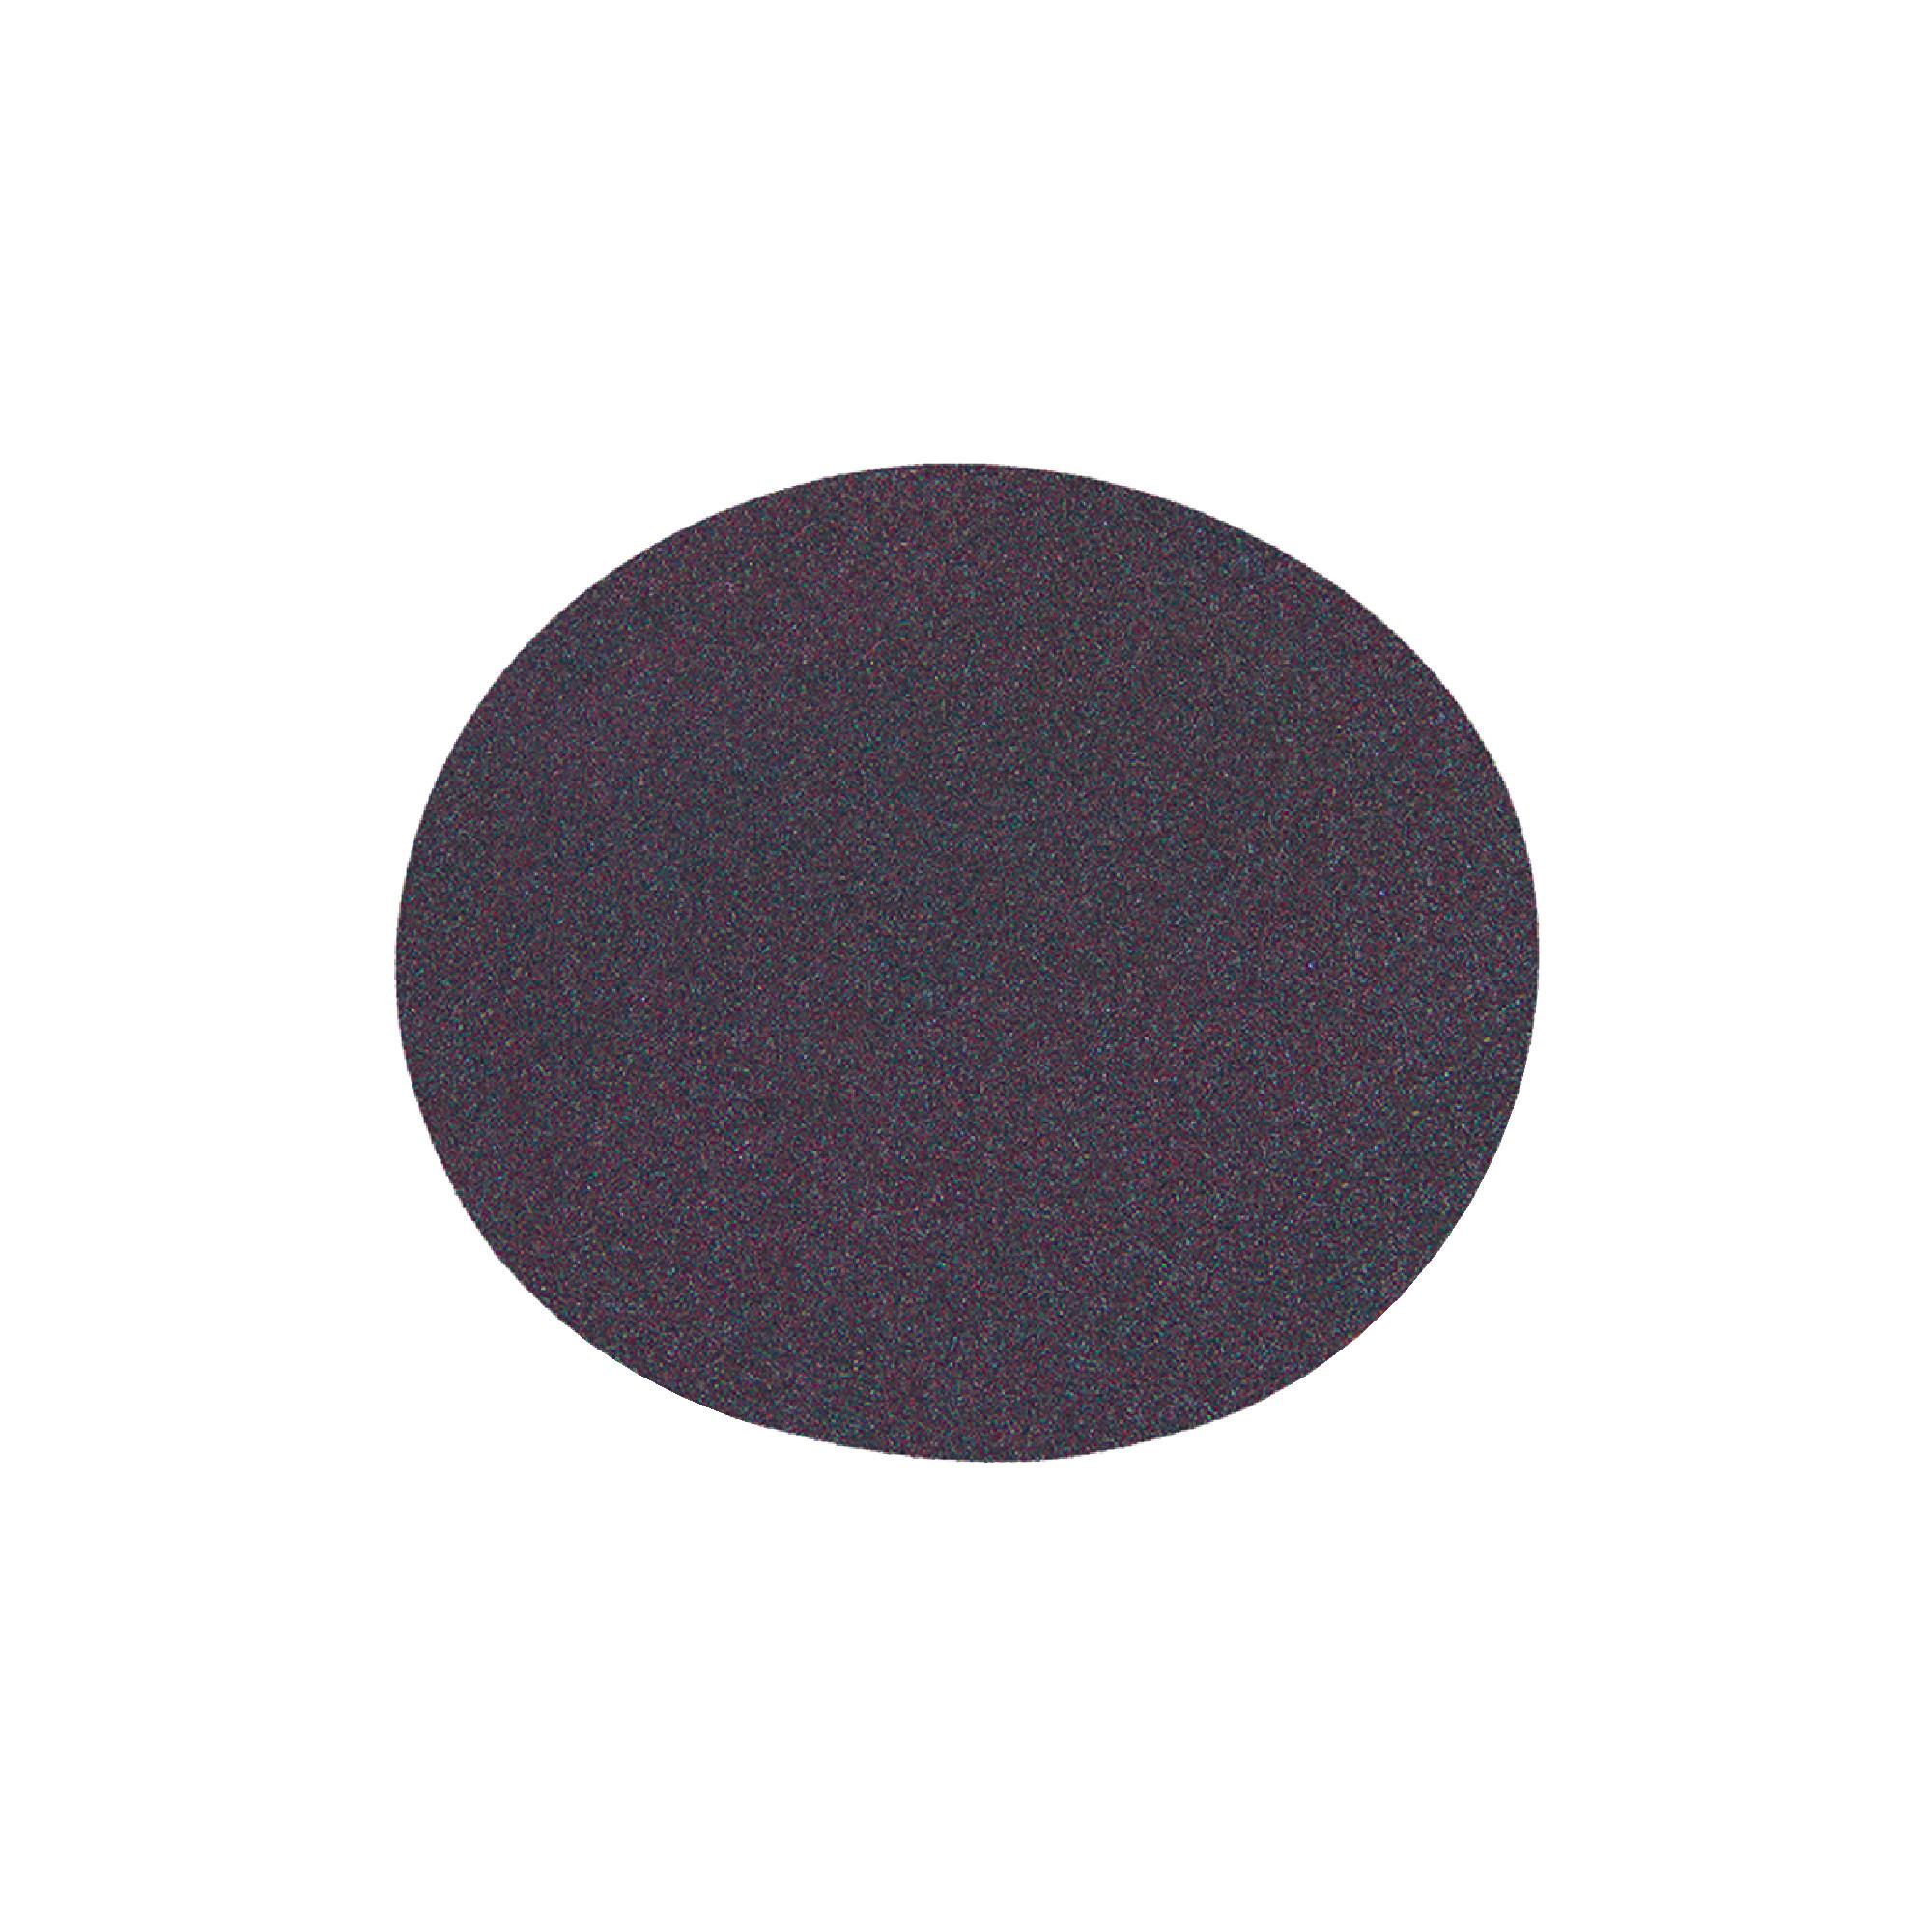 248D/348D Three-M-ite Resin Bond PSA Discs - Aluminum Oxide